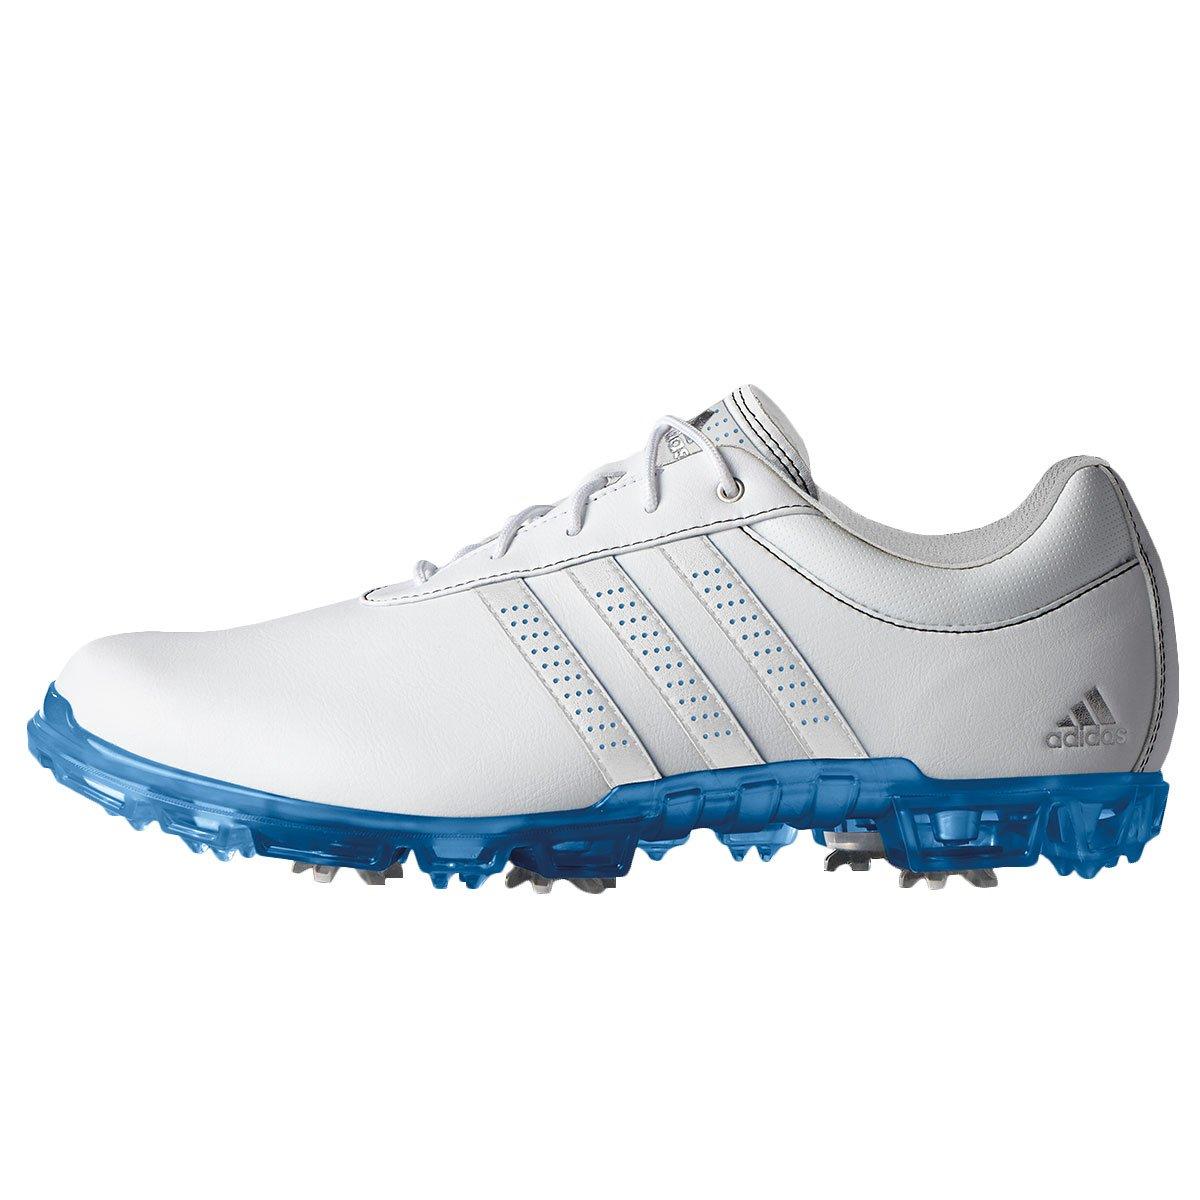 Adidas adiPure Flex amplia impermeable ligera 2018 hombre  Golf zapatos